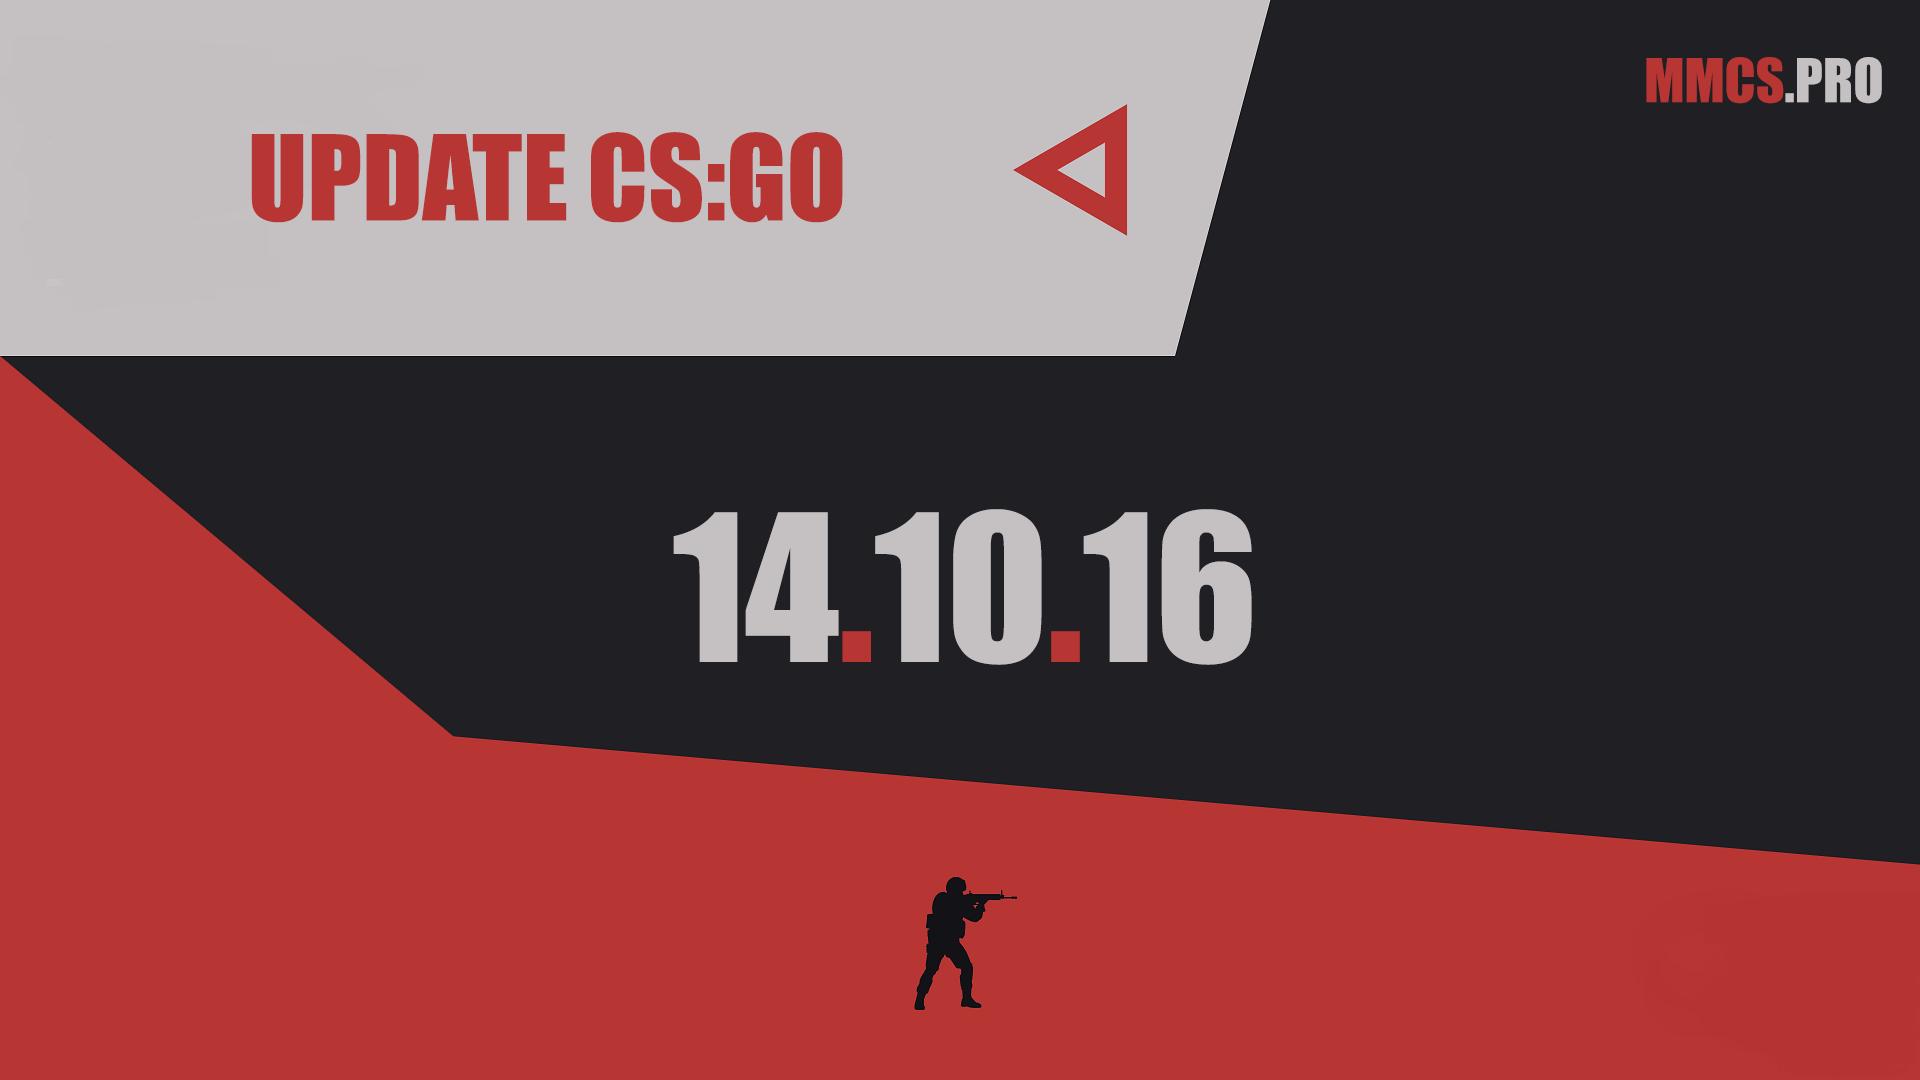 https://mmcs.pro/update-csgo-14-10-2016-valve/